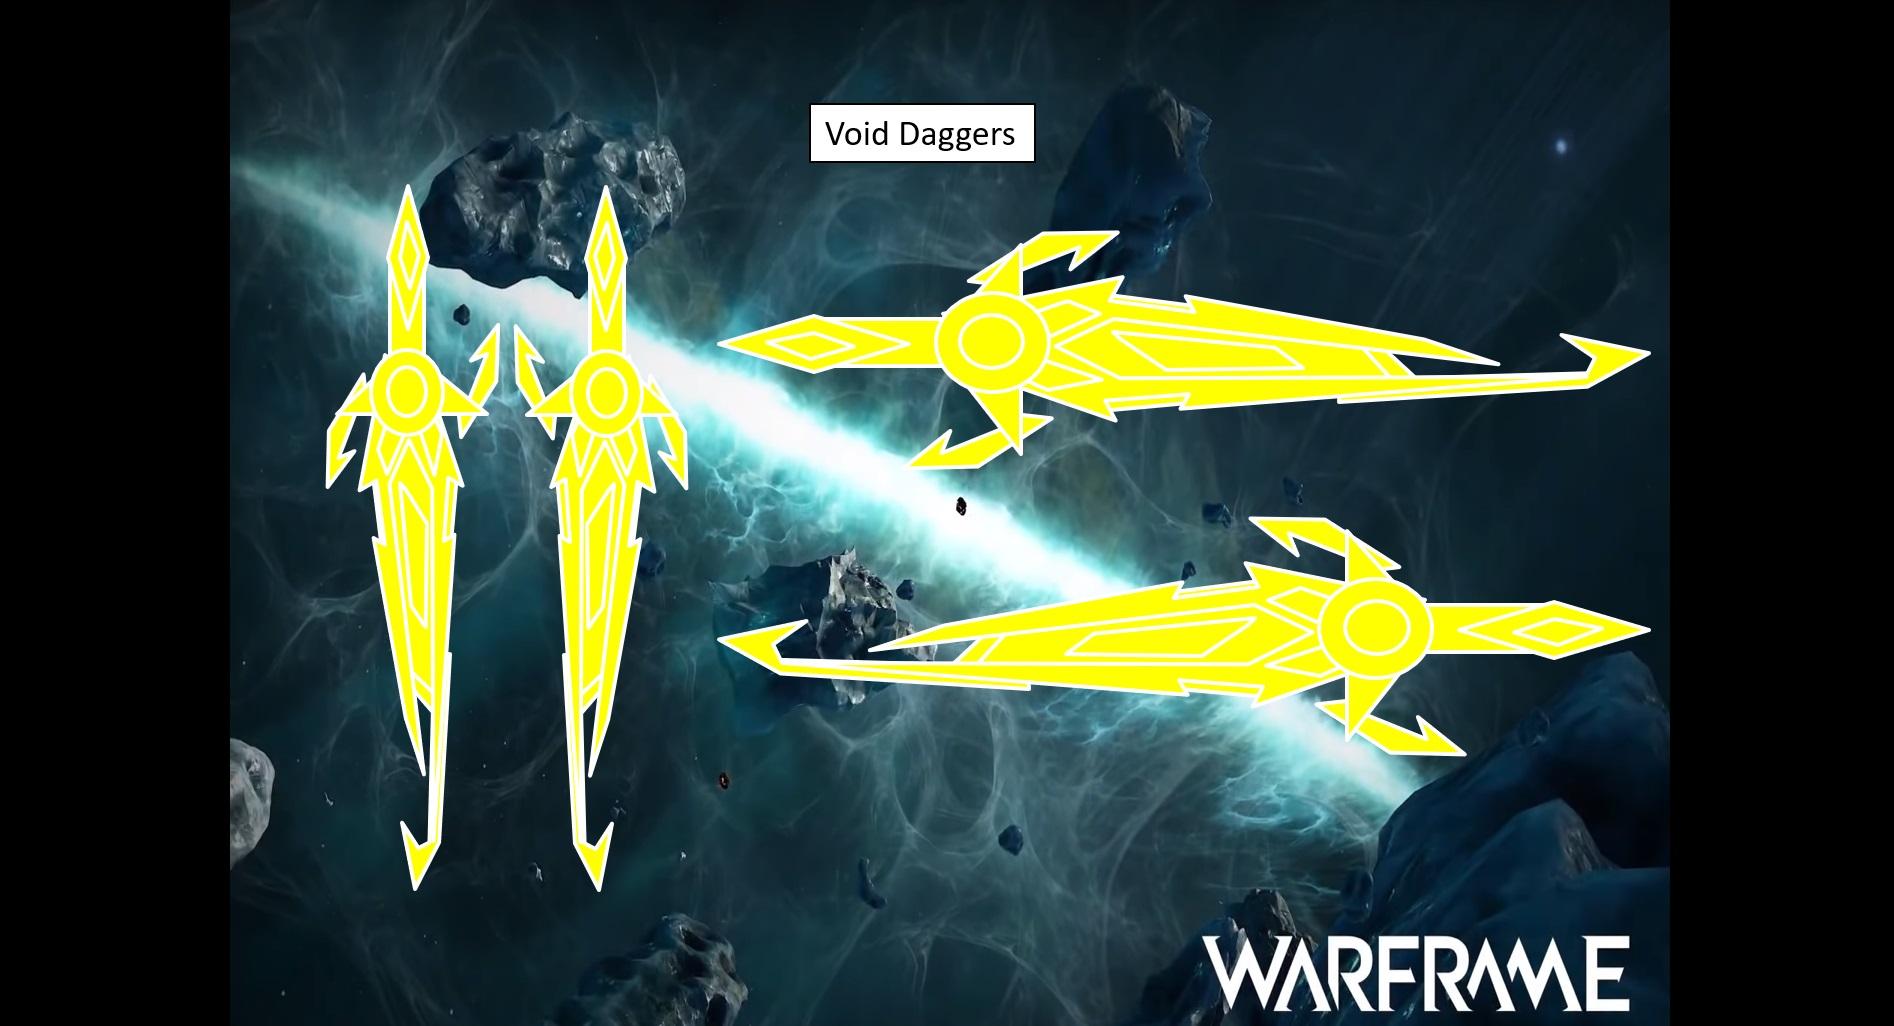 Operator void daggers by Aaronj-c